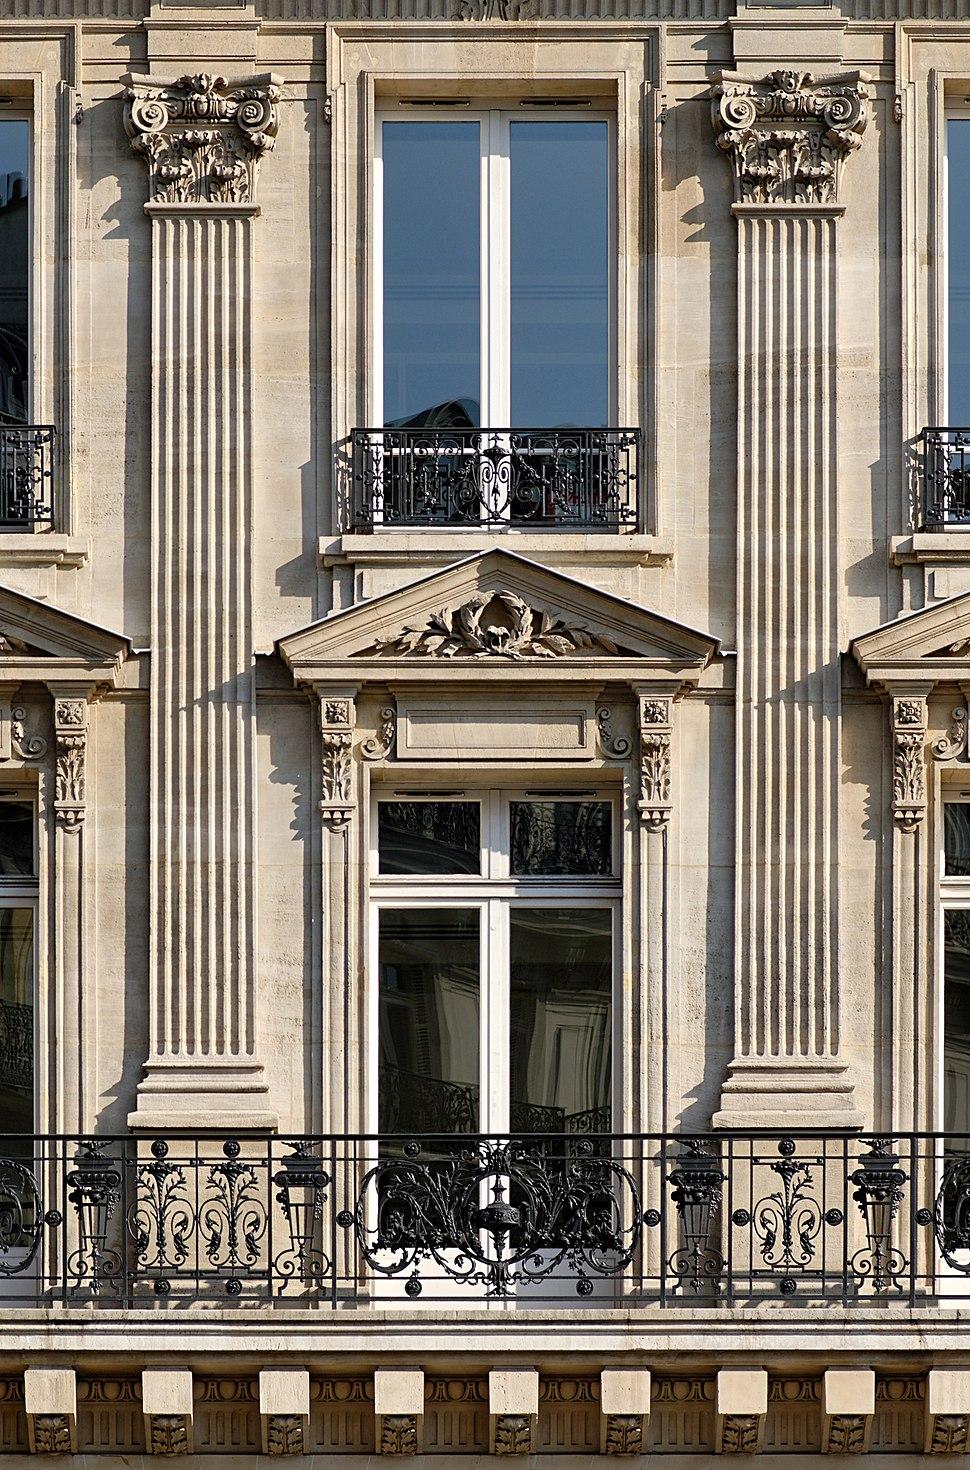 Colossal order 8 avenue Opera Paris